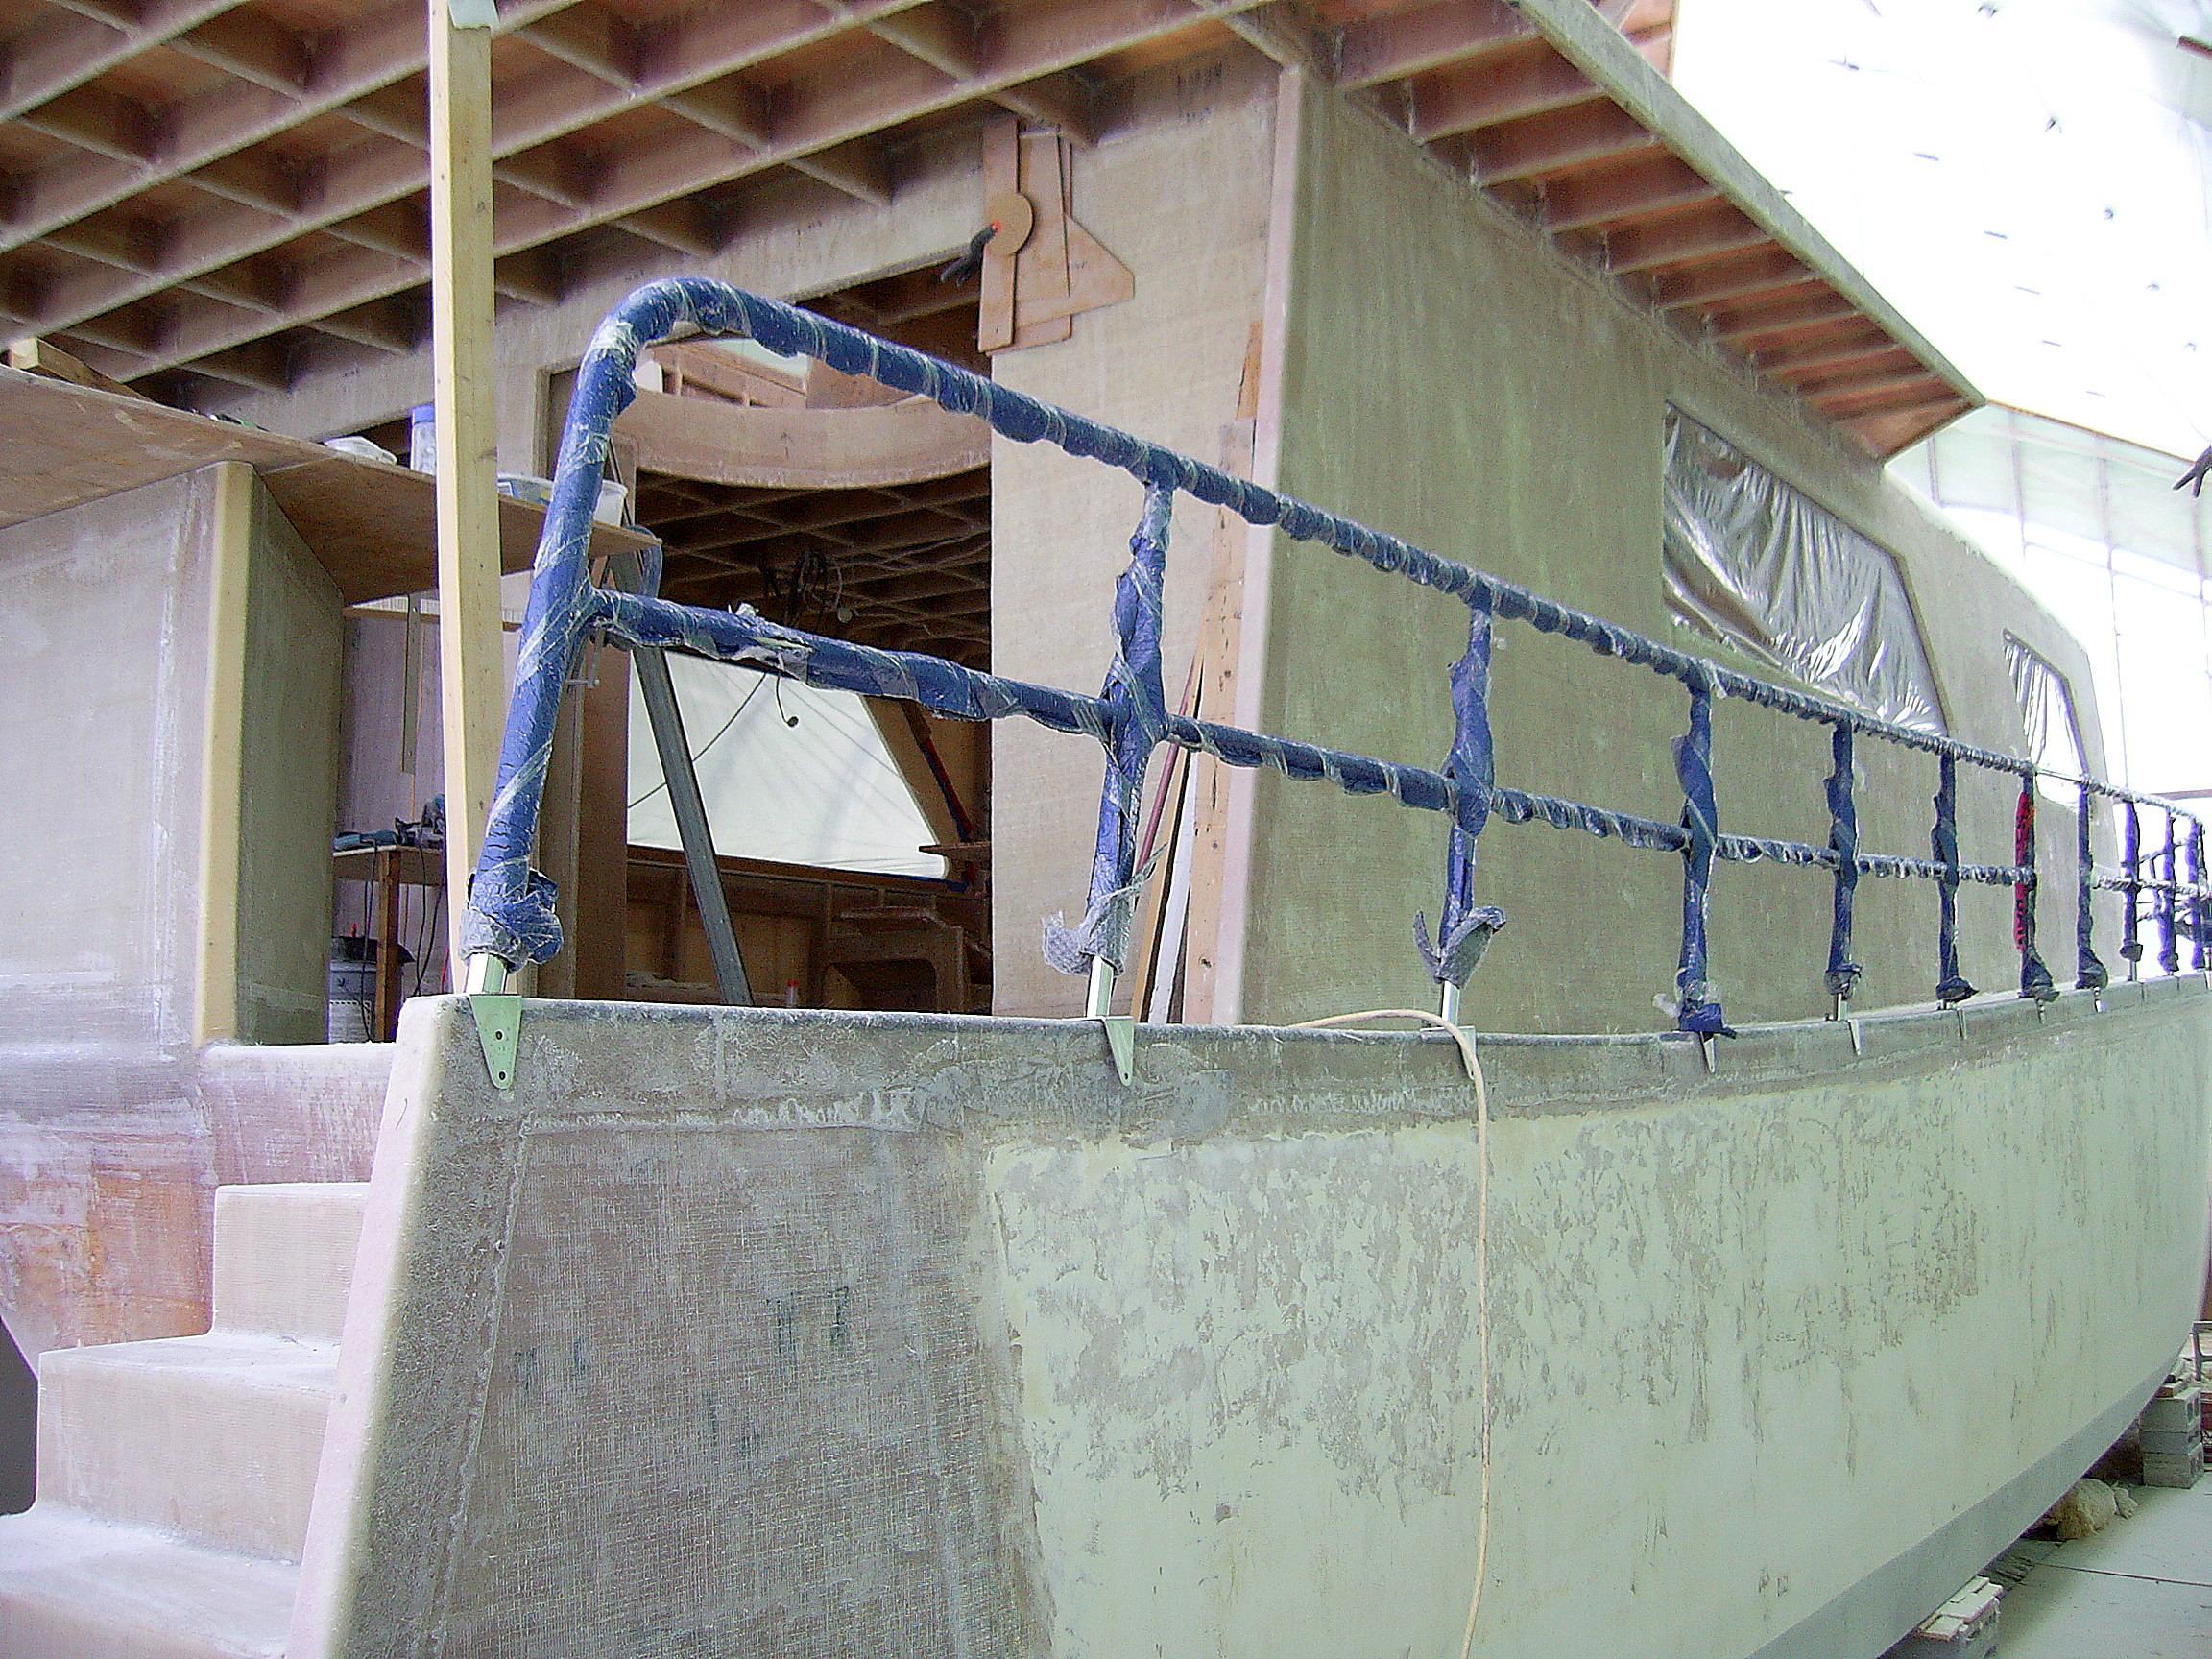 Flybridge Power Catamaran Under Construction